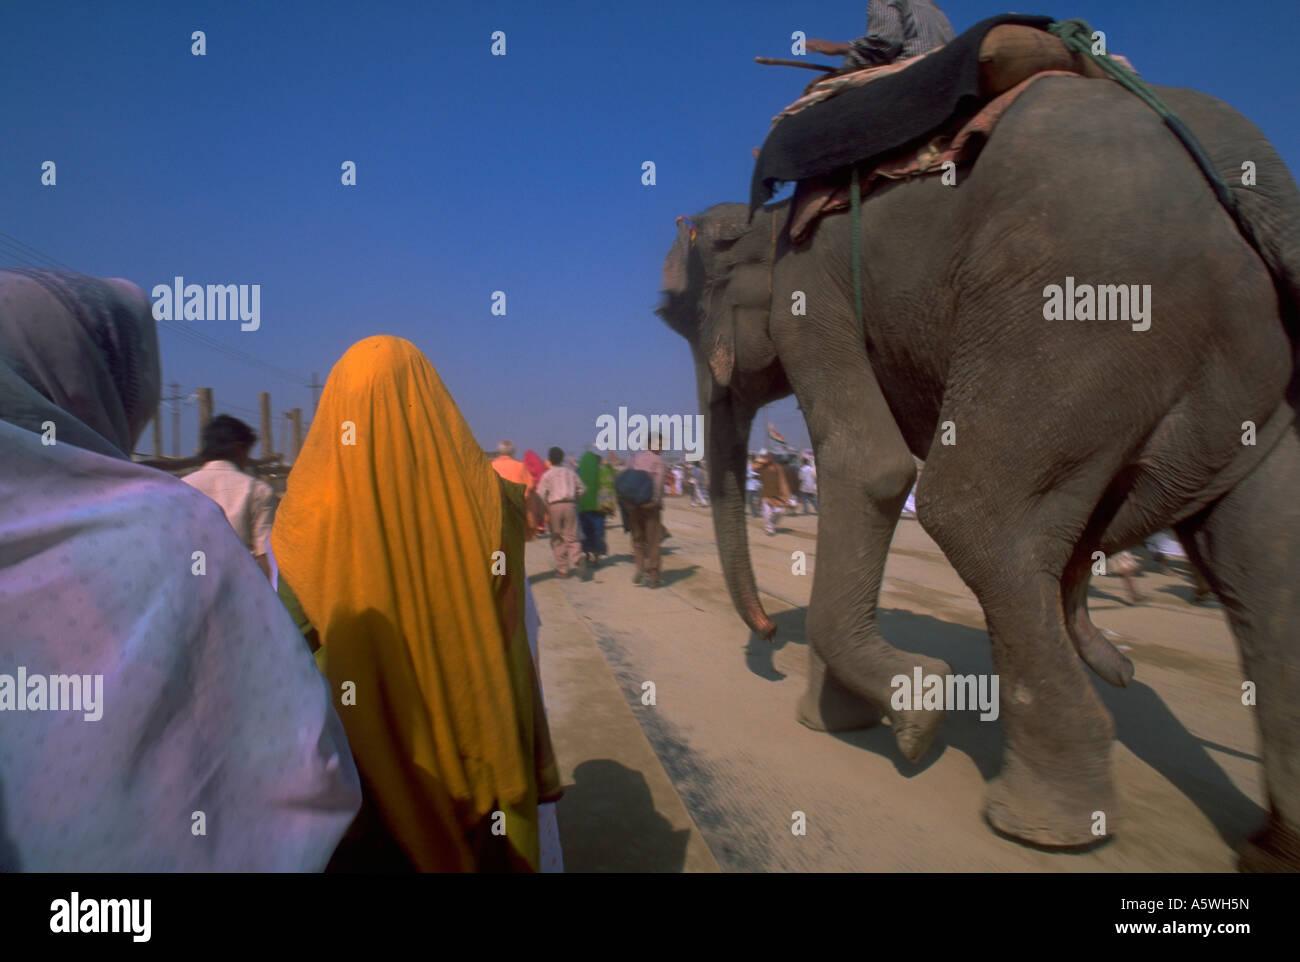 Painet hl0317 eleephant walking worshipers 2001 kumbhmela festival allahabad india hindu peasant streaming migrating - Stock Image